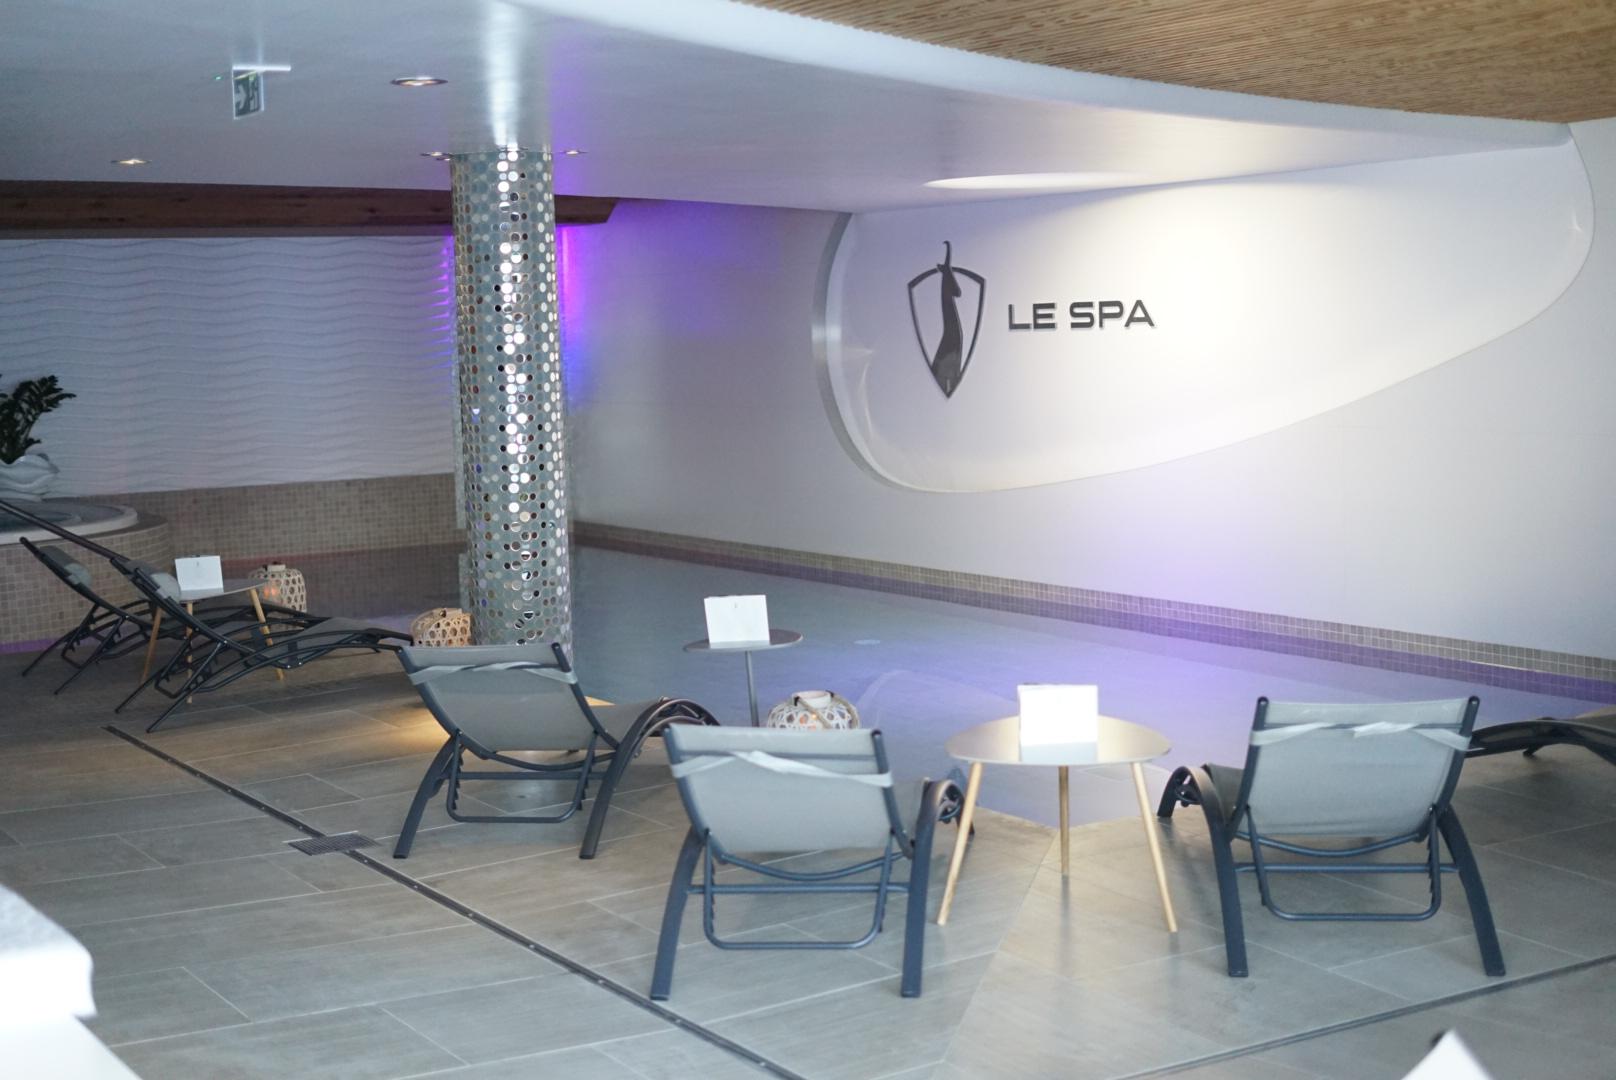 jacuzzi, pool, relaxation, spa, area, val thorens, pashmina, hotel, pashmina hotel, refuge, terrace, mountain, trip, holidays